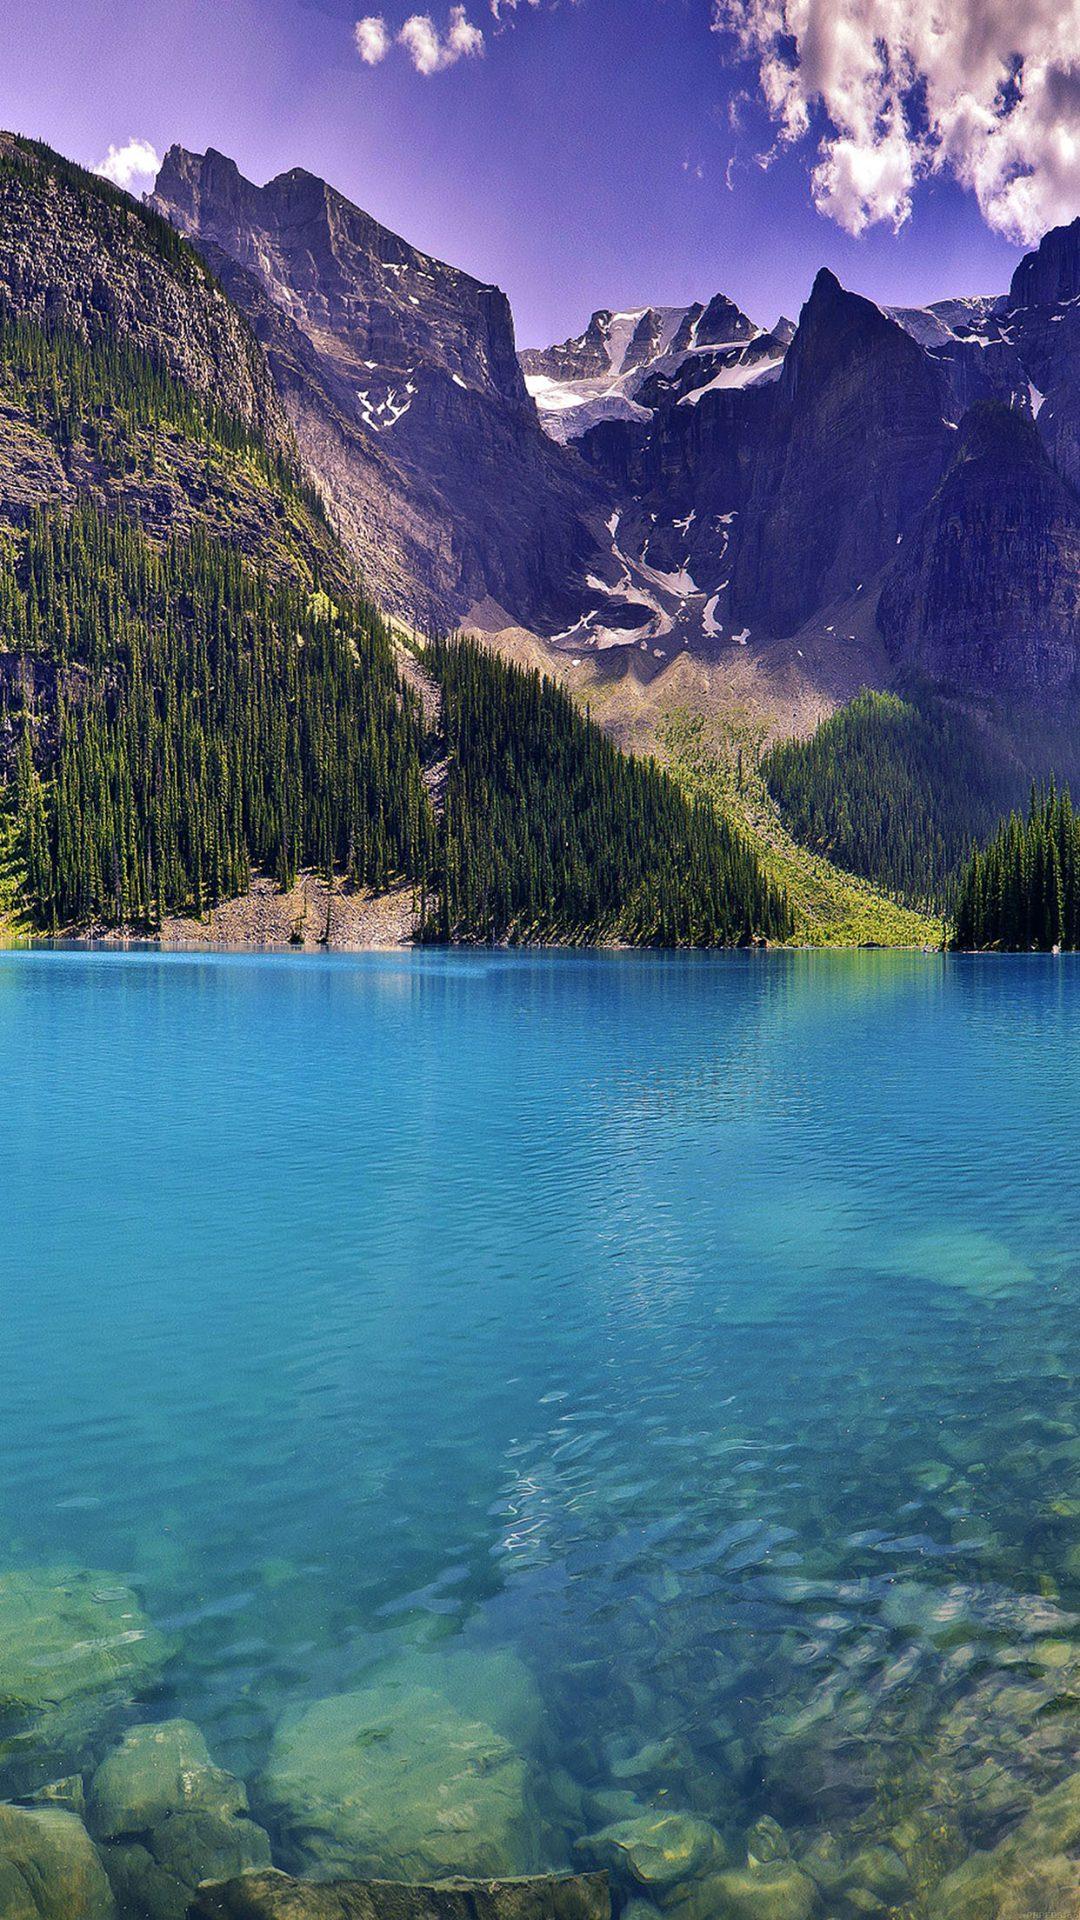 Wallpaper Green Dive Lake River Nature Mountain